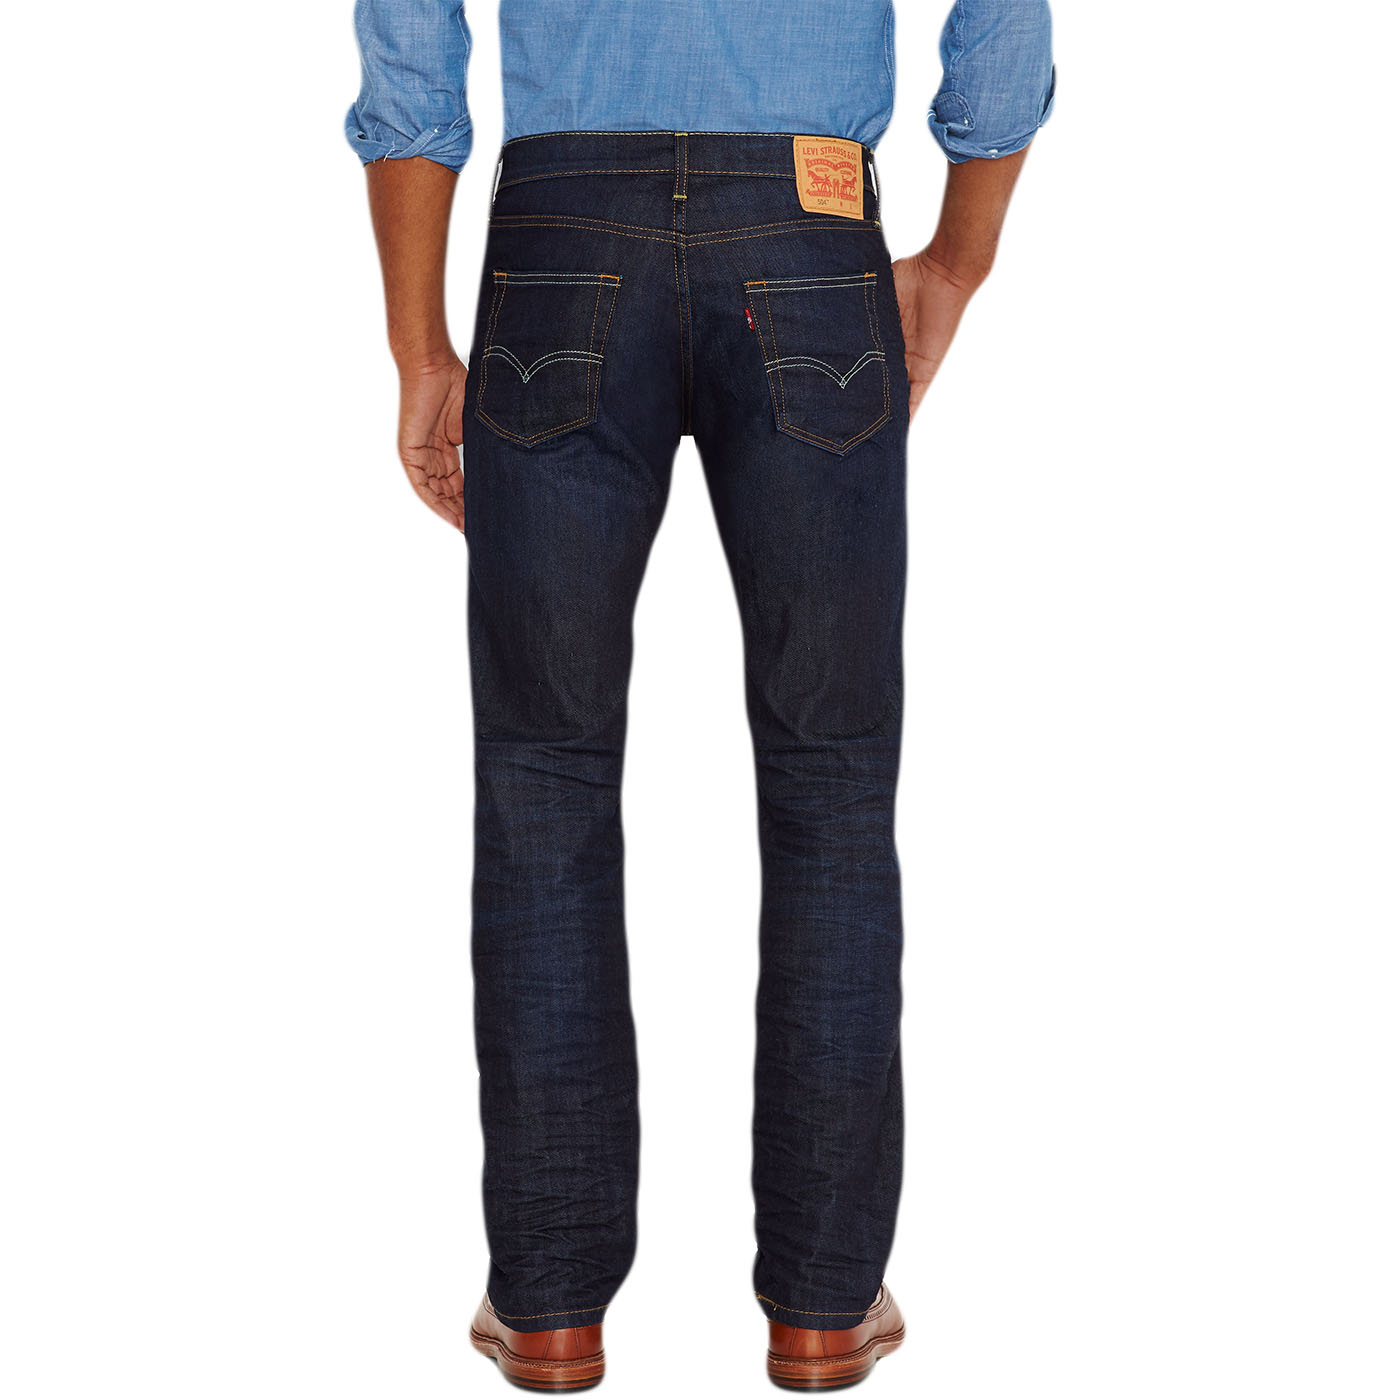 mens levi jeans 504 straight denim fit 39 the rich 39 30 32 33 34 36 38 straight leg mr h menswear. Black Bedroom Furniture Sets. Home Design Ideas